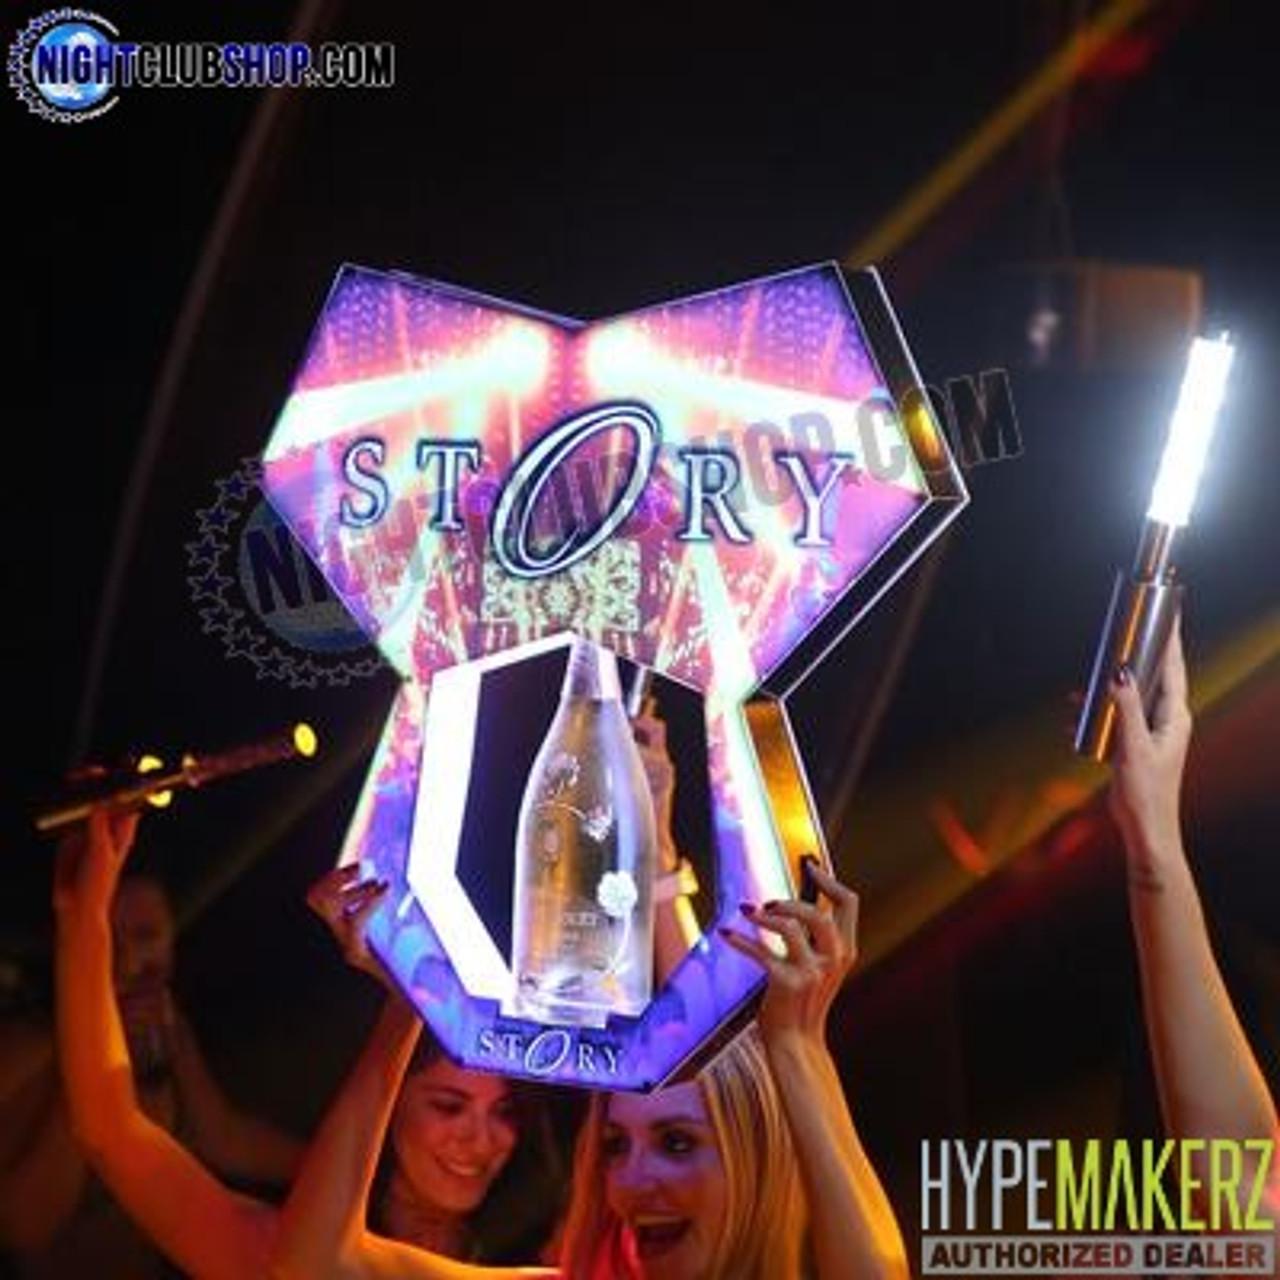 LED, Nexus, Bottle, Presenter, Liquor, Delivery, VIP, Exclusive, Nightclub, Nightlife, Club, Bar, Casino